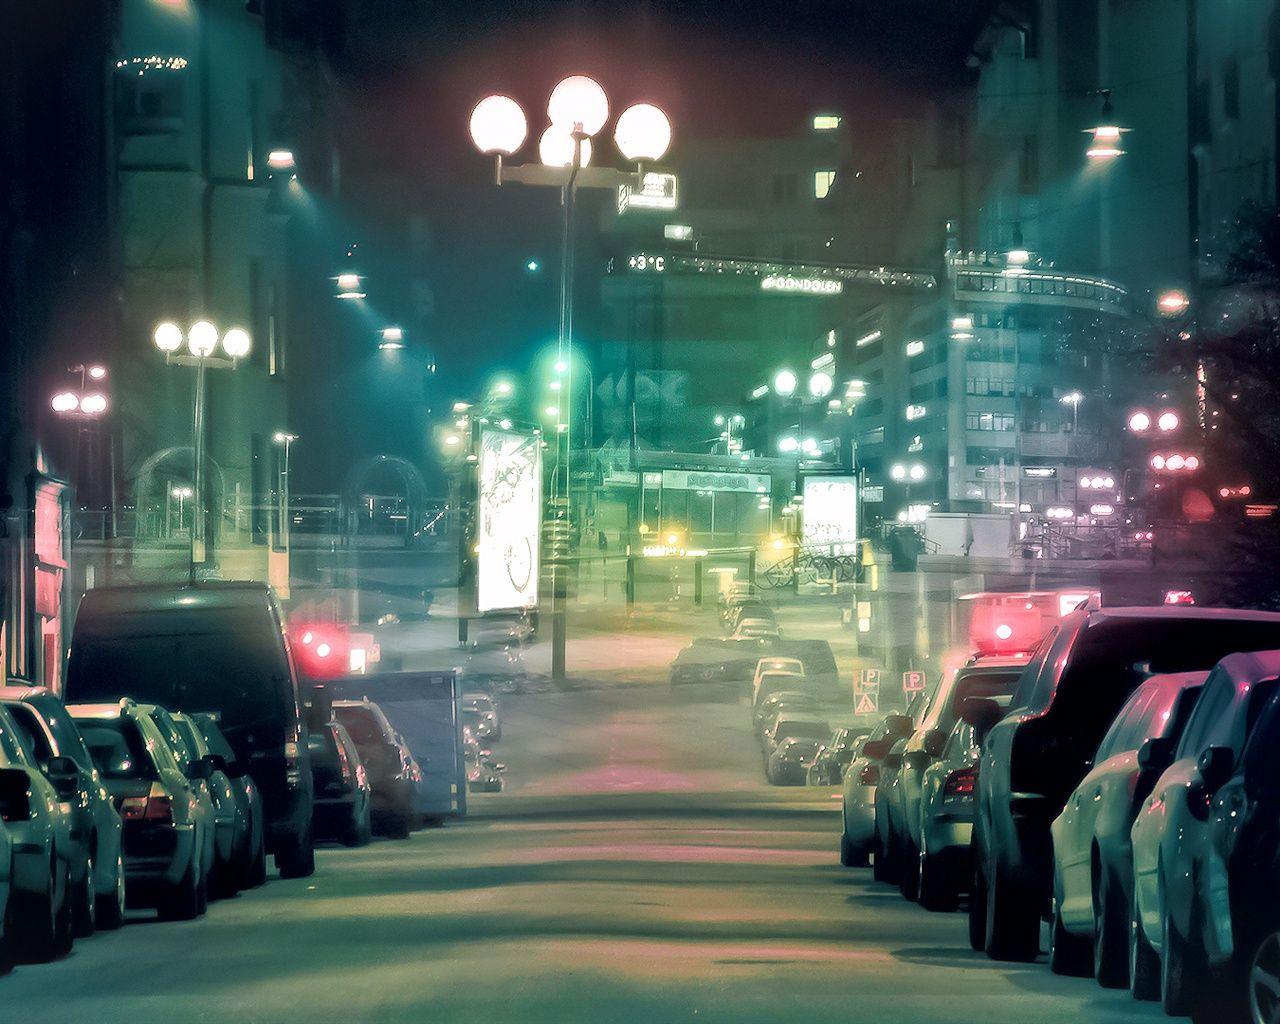 6x8ft City Street Backdrop Urban Road Photography Background Avenue Buildings Cars Traffic Lights Man Boy Adult Girl Artistic Portrait Photo Shoot Studio Props Video Drop Vinyl Wallpaper Drape